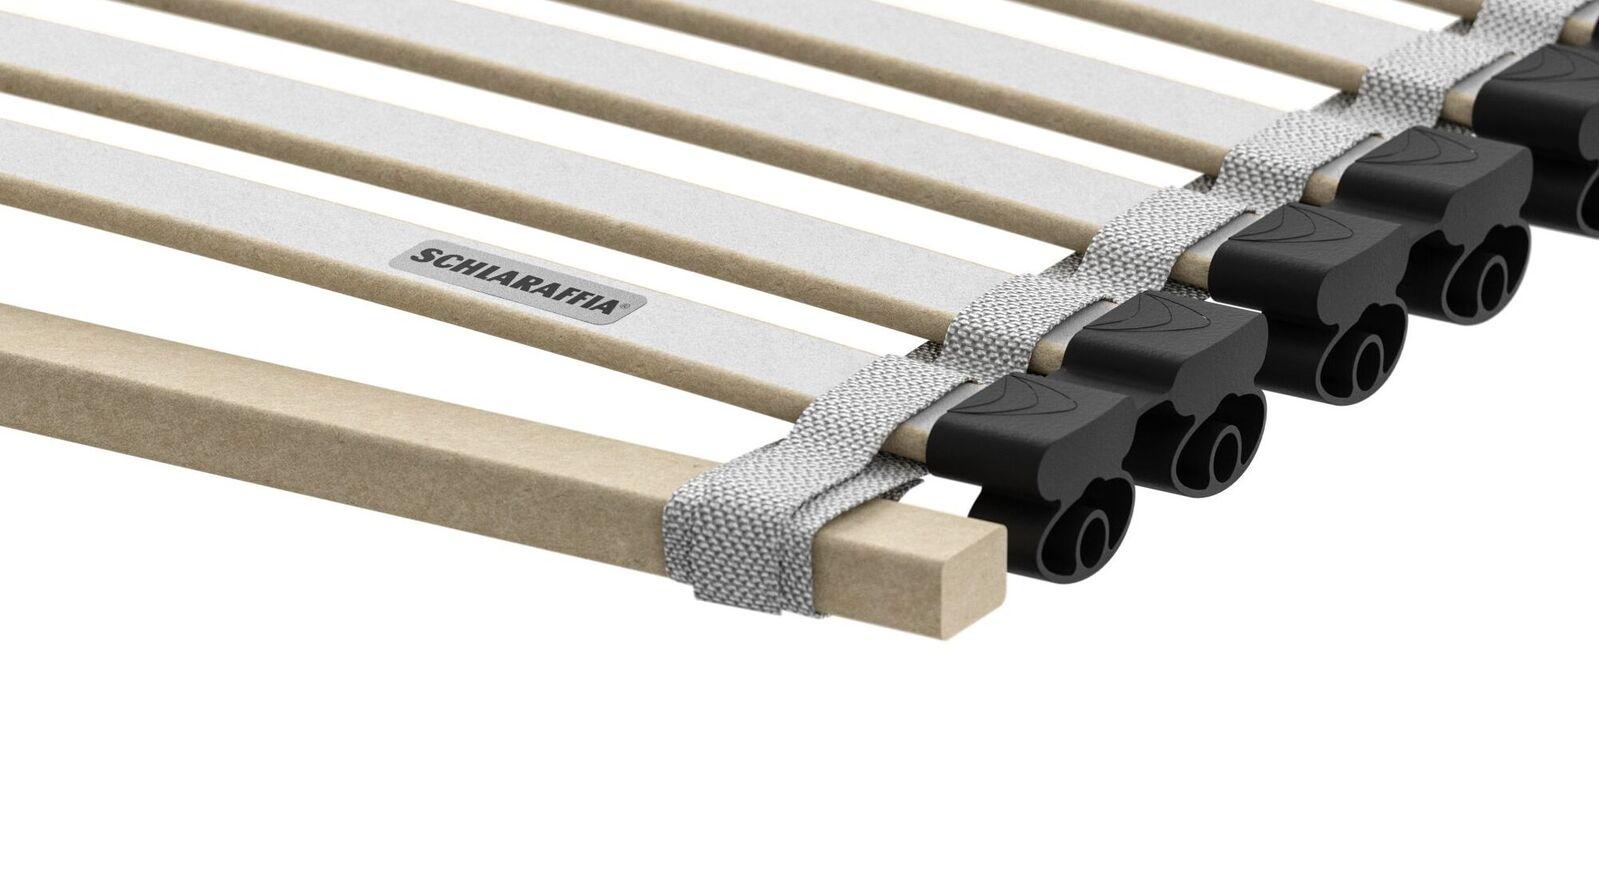 SCHLARAFFIA Lattenrost Roll-n-Sleep mit starkem Halteband